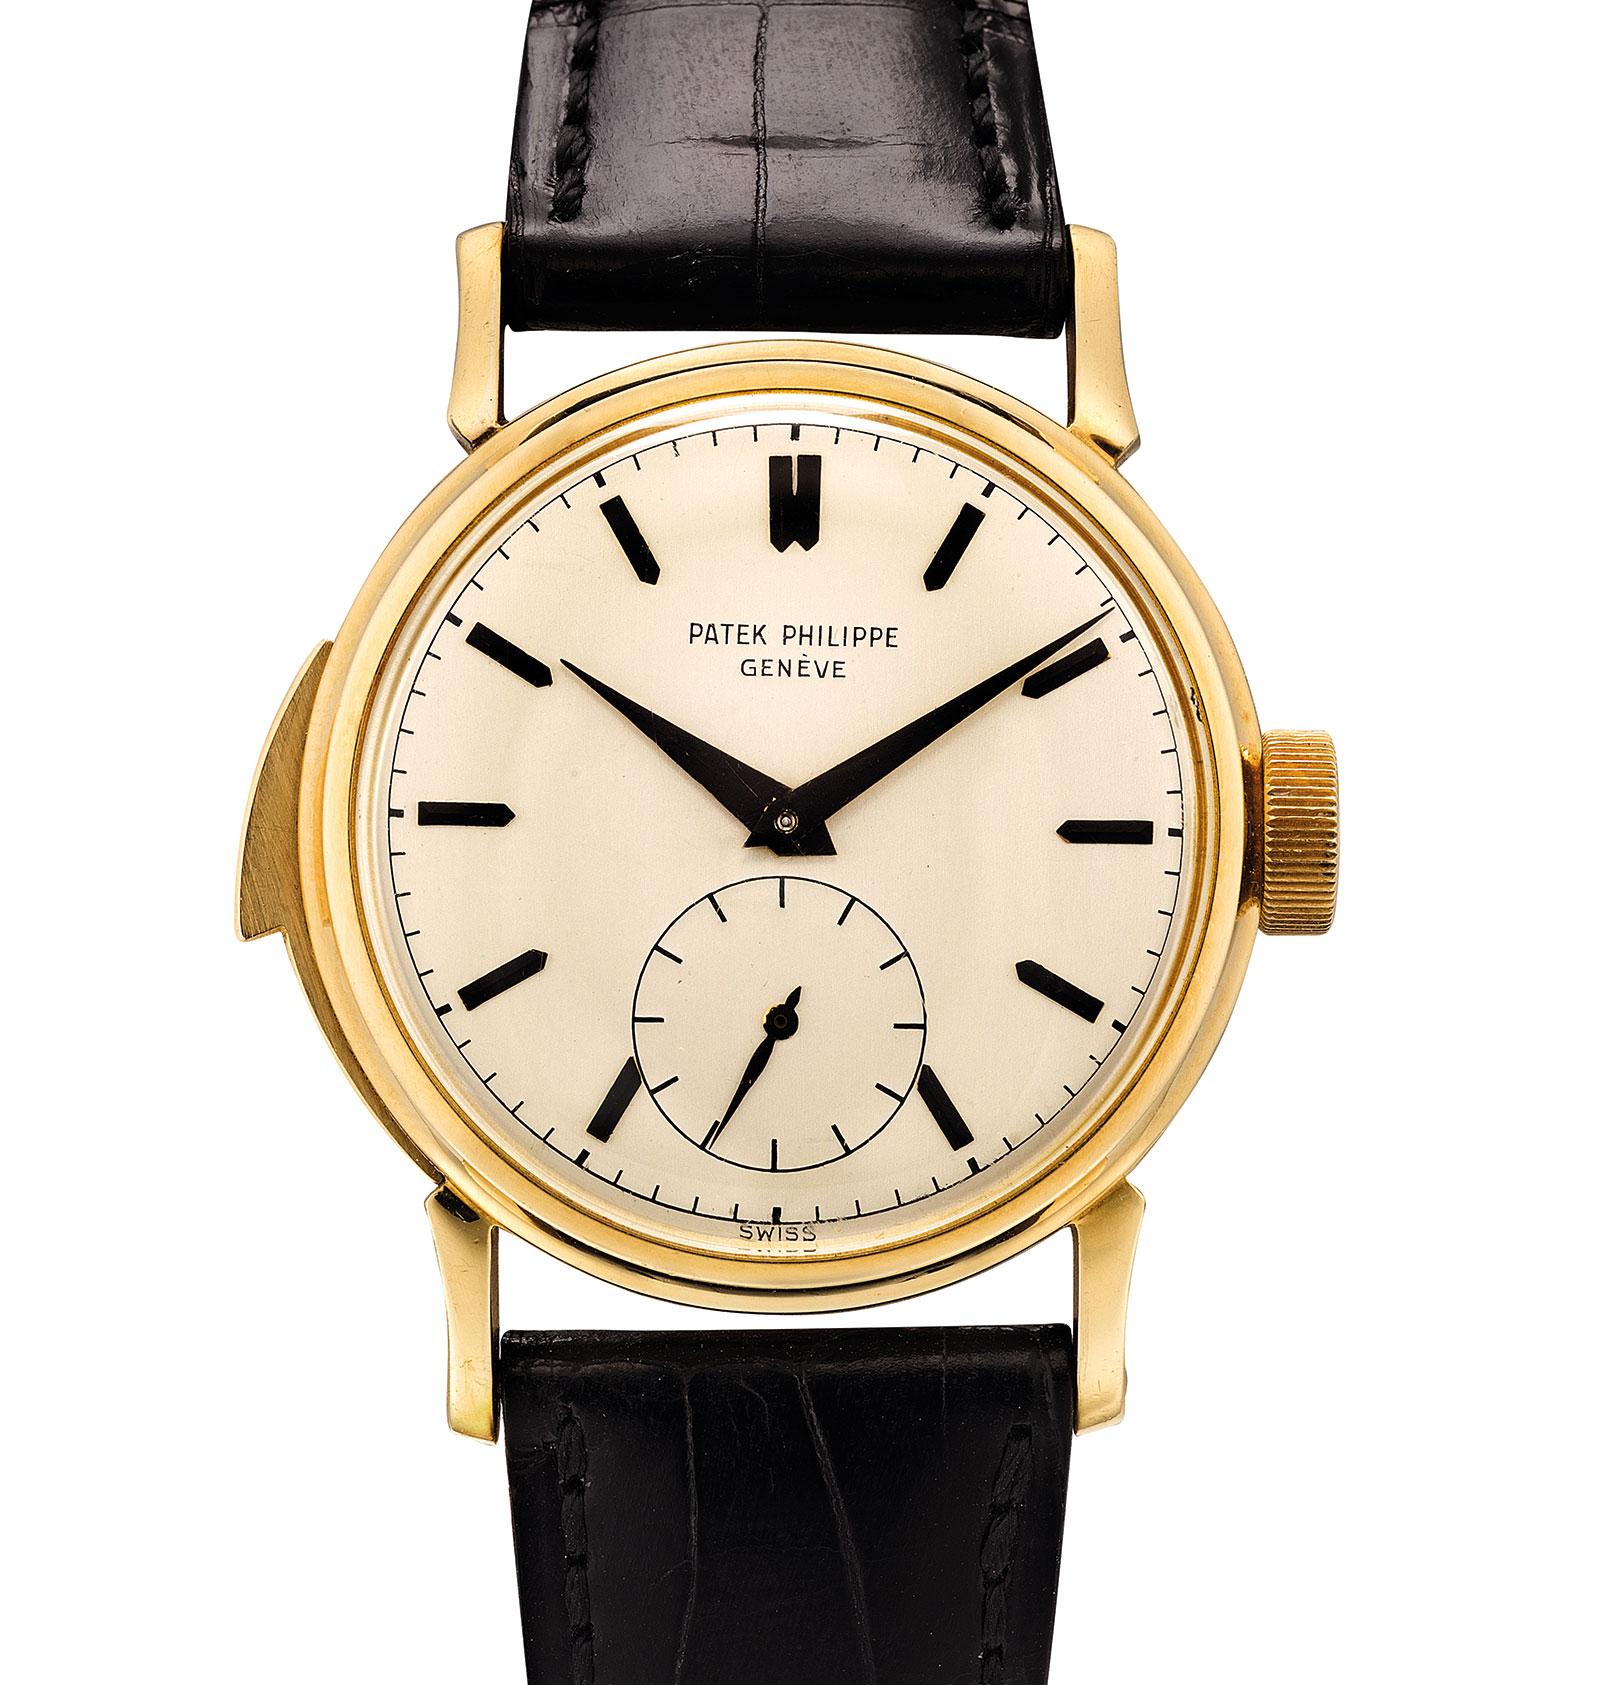 Patek Philippe 2419 minute repeater Cartier 1